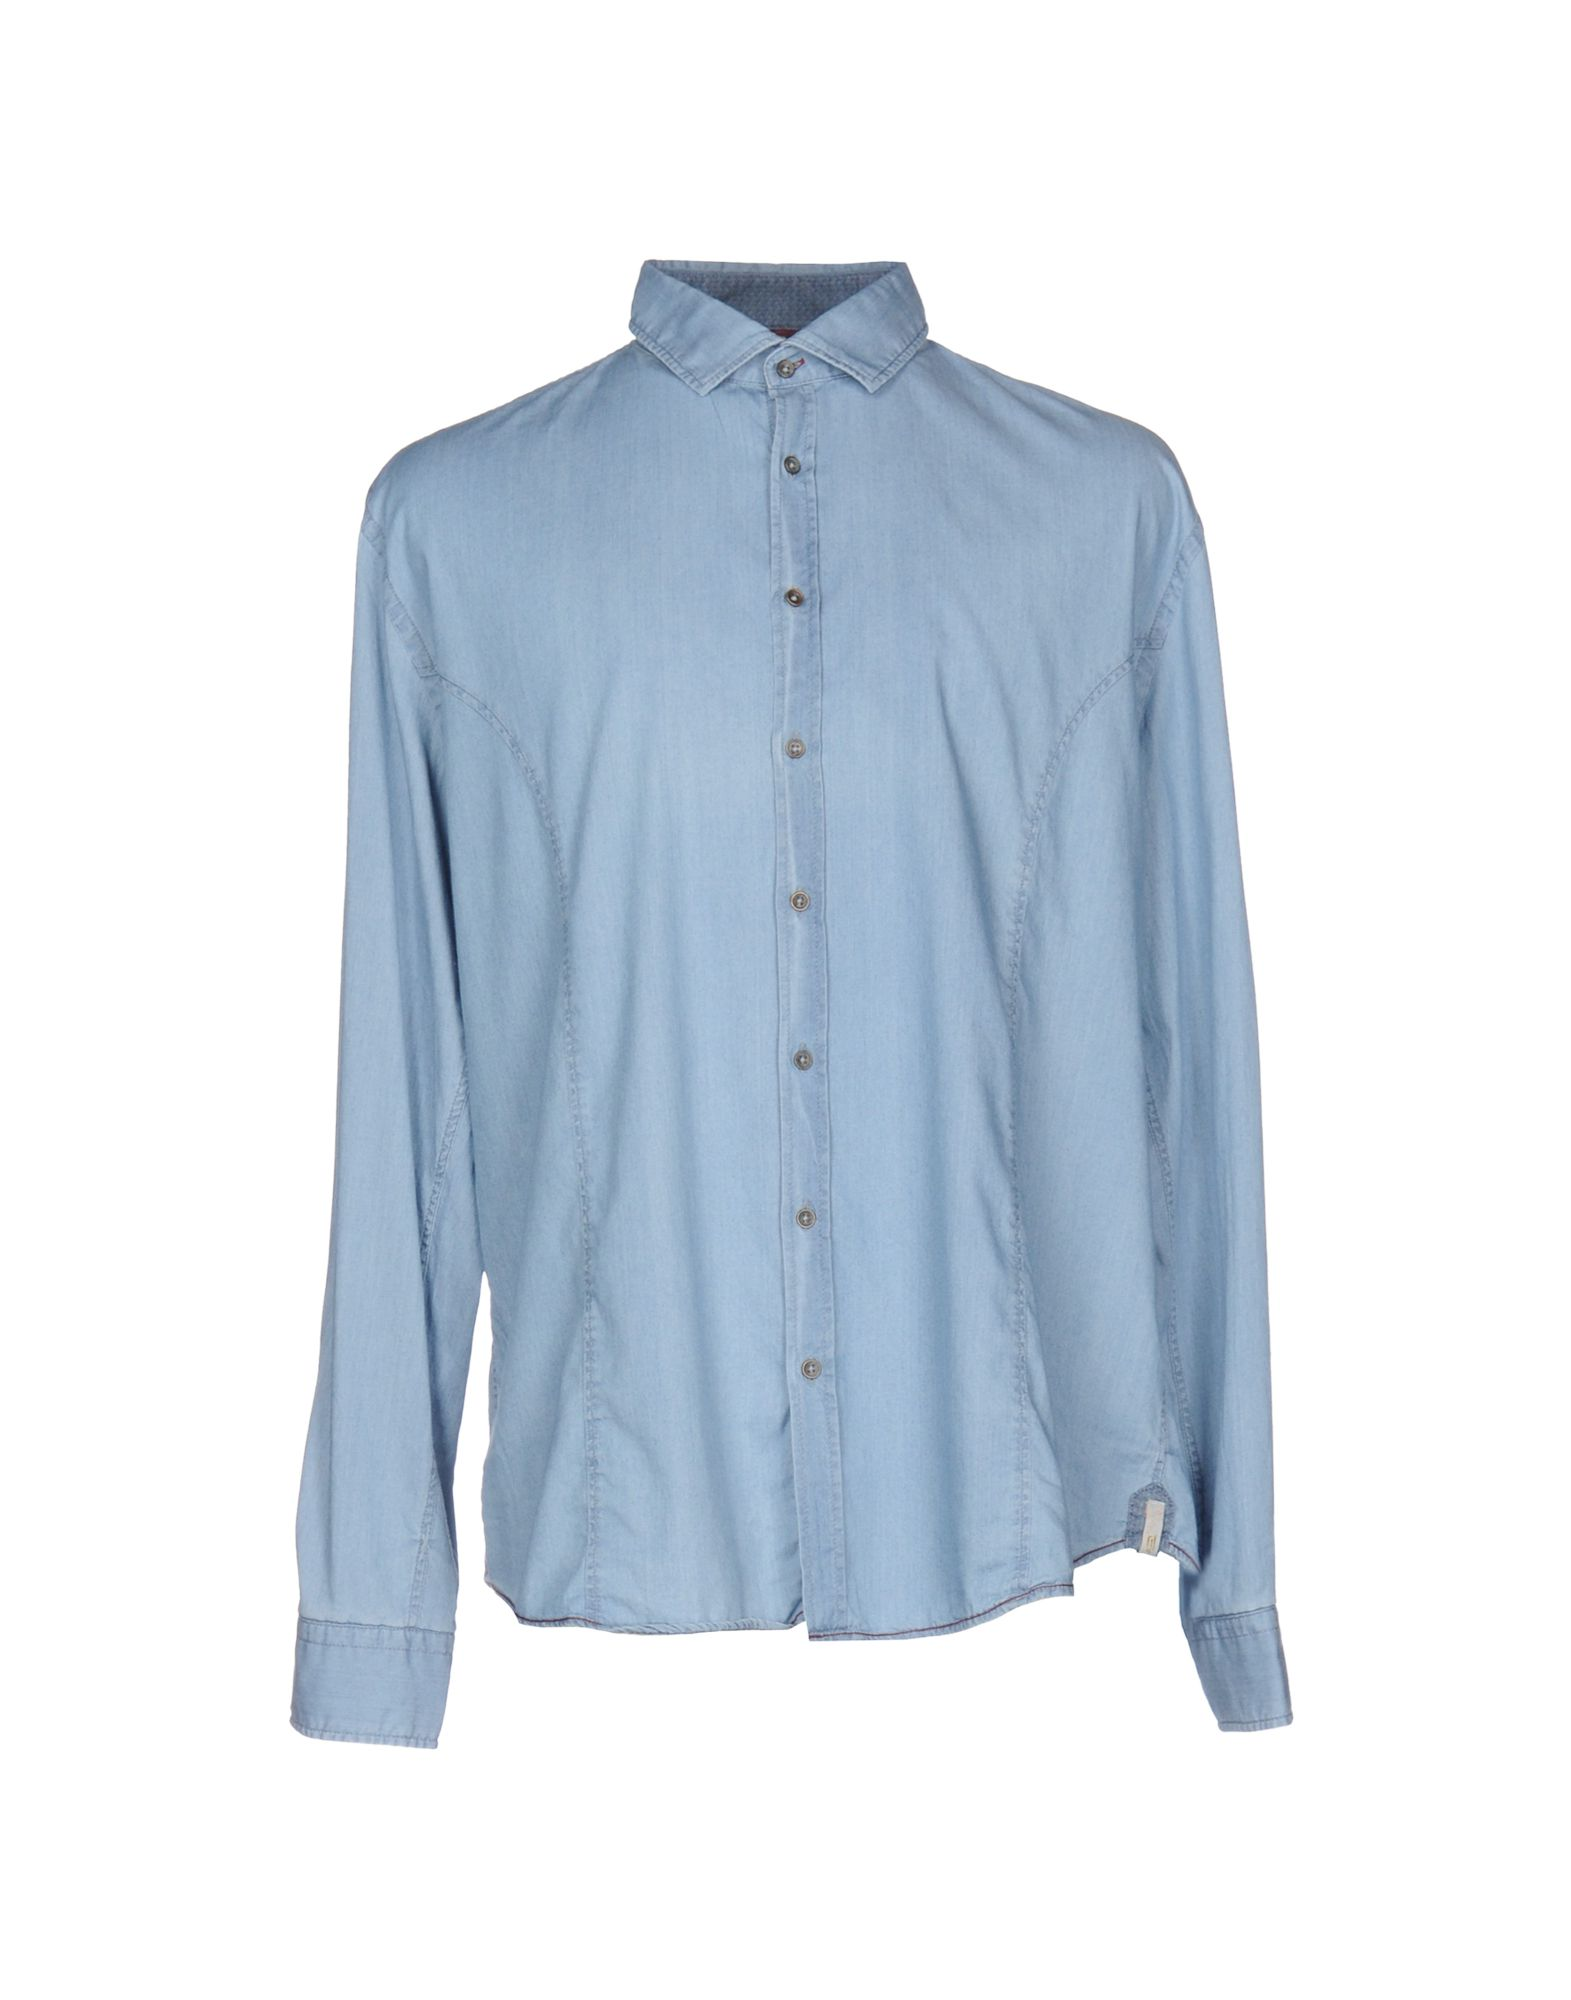 Q1 Джинсовая рубашка laxc021t1b q1